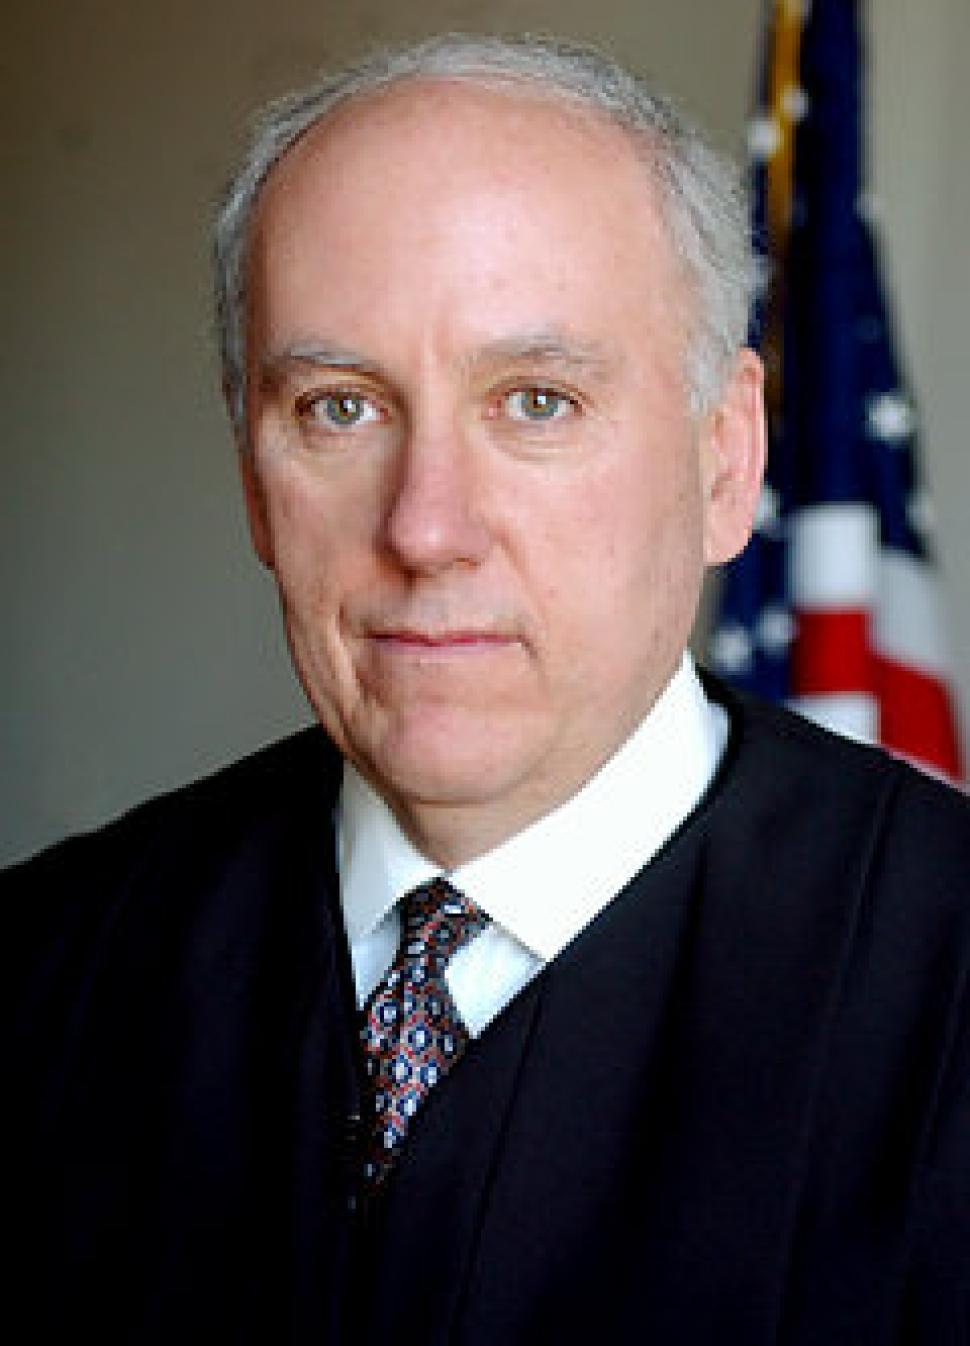 Castel Kevin-Judge